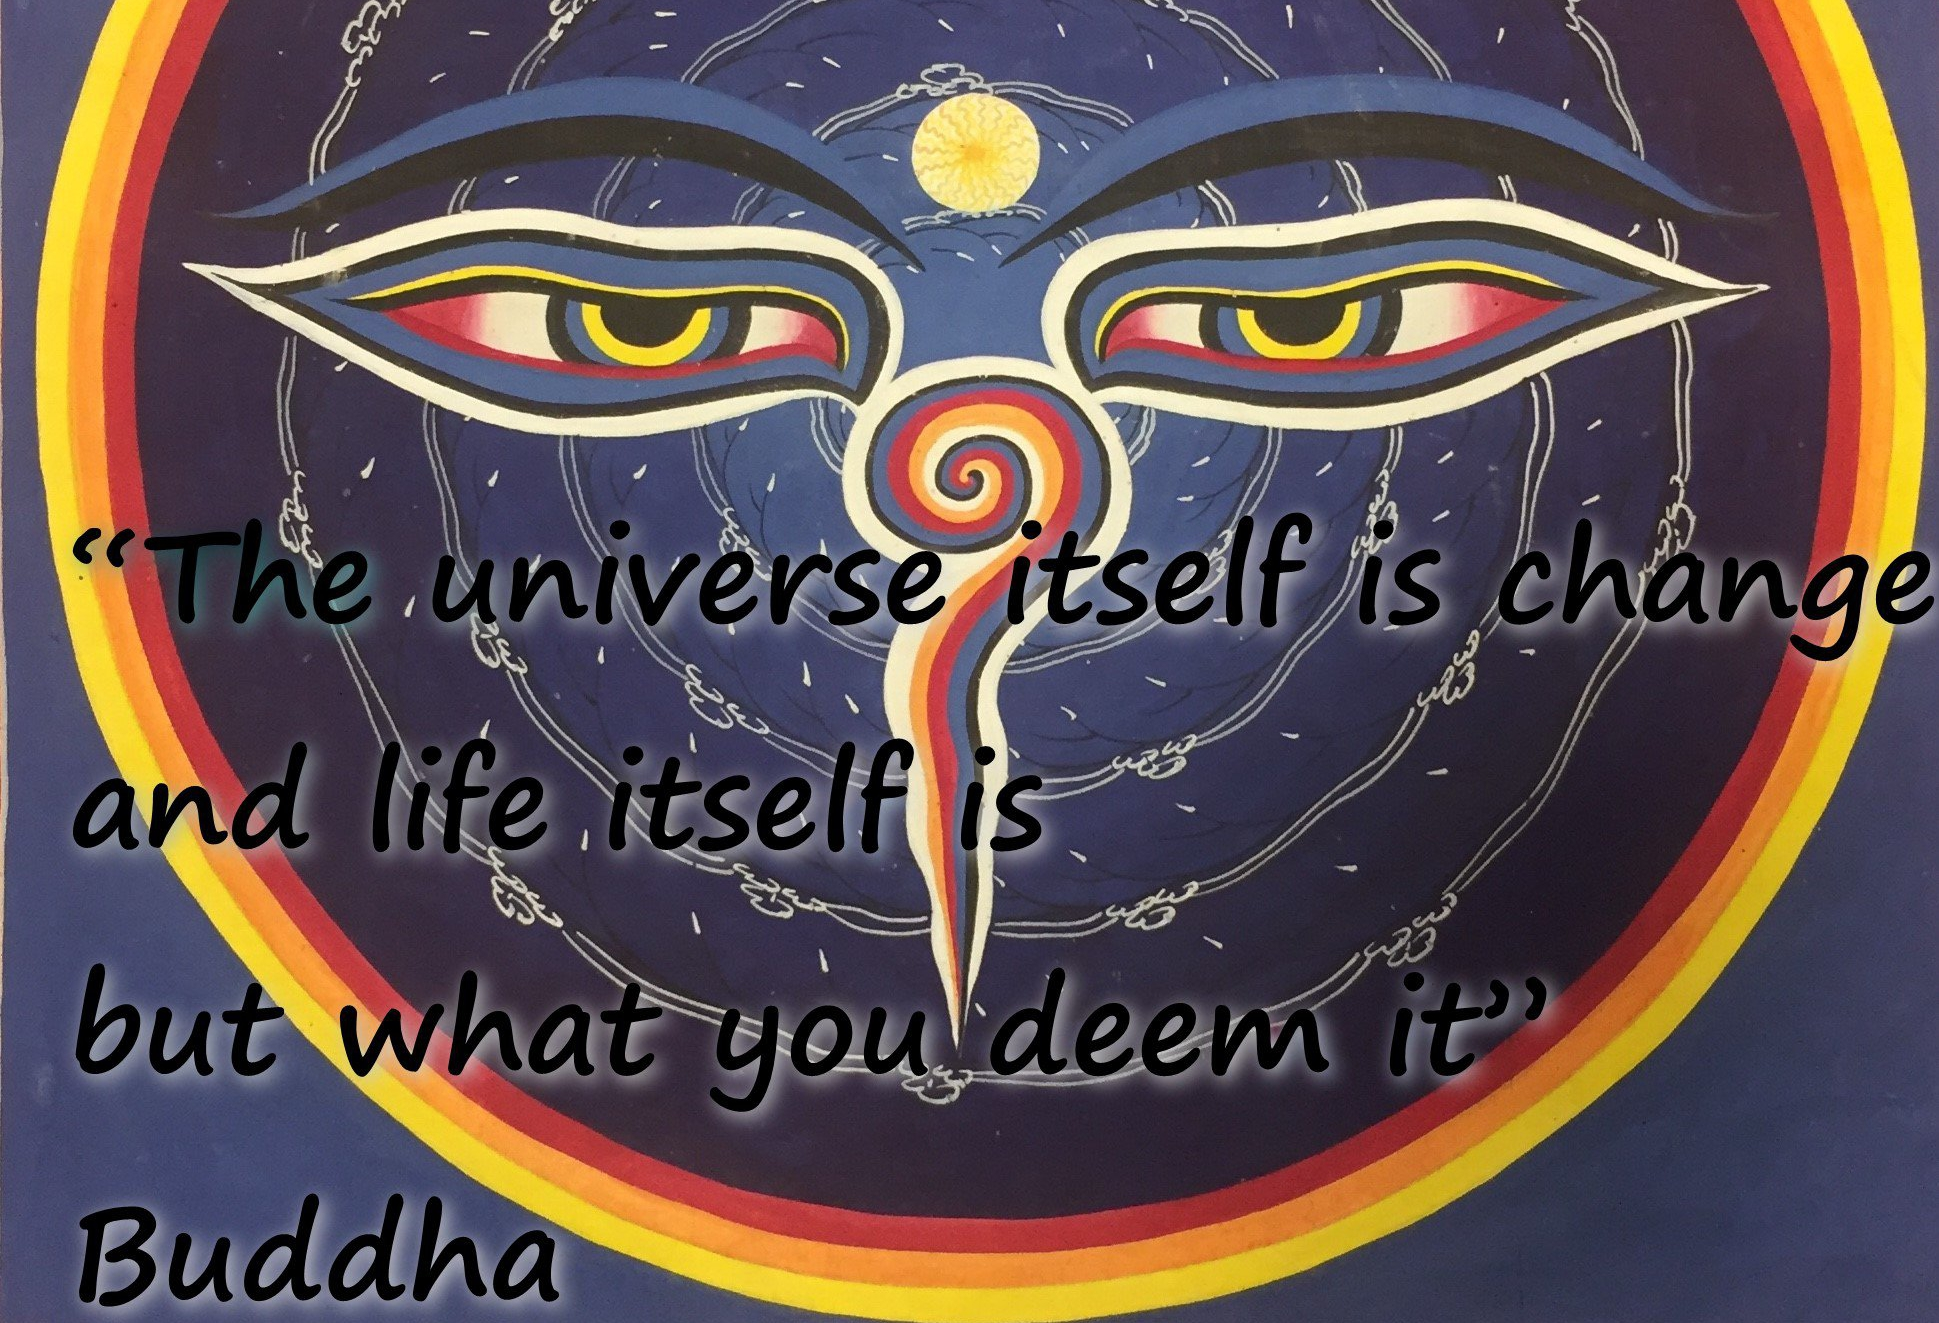 The universe itself is change